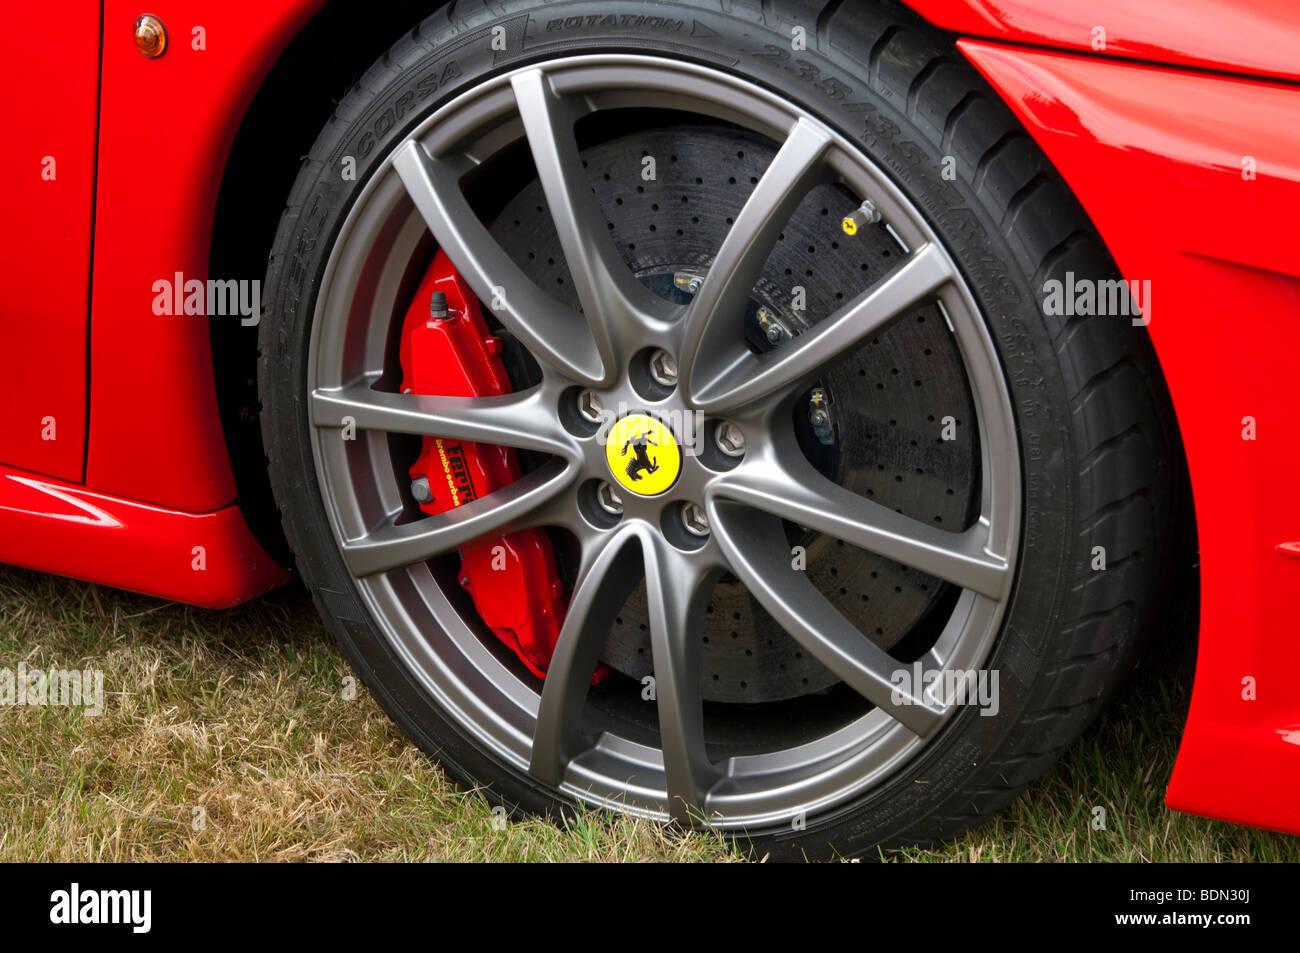 Ferrari Brake Caliper Stock Photos \u0026 Ferrari Brake Caliper